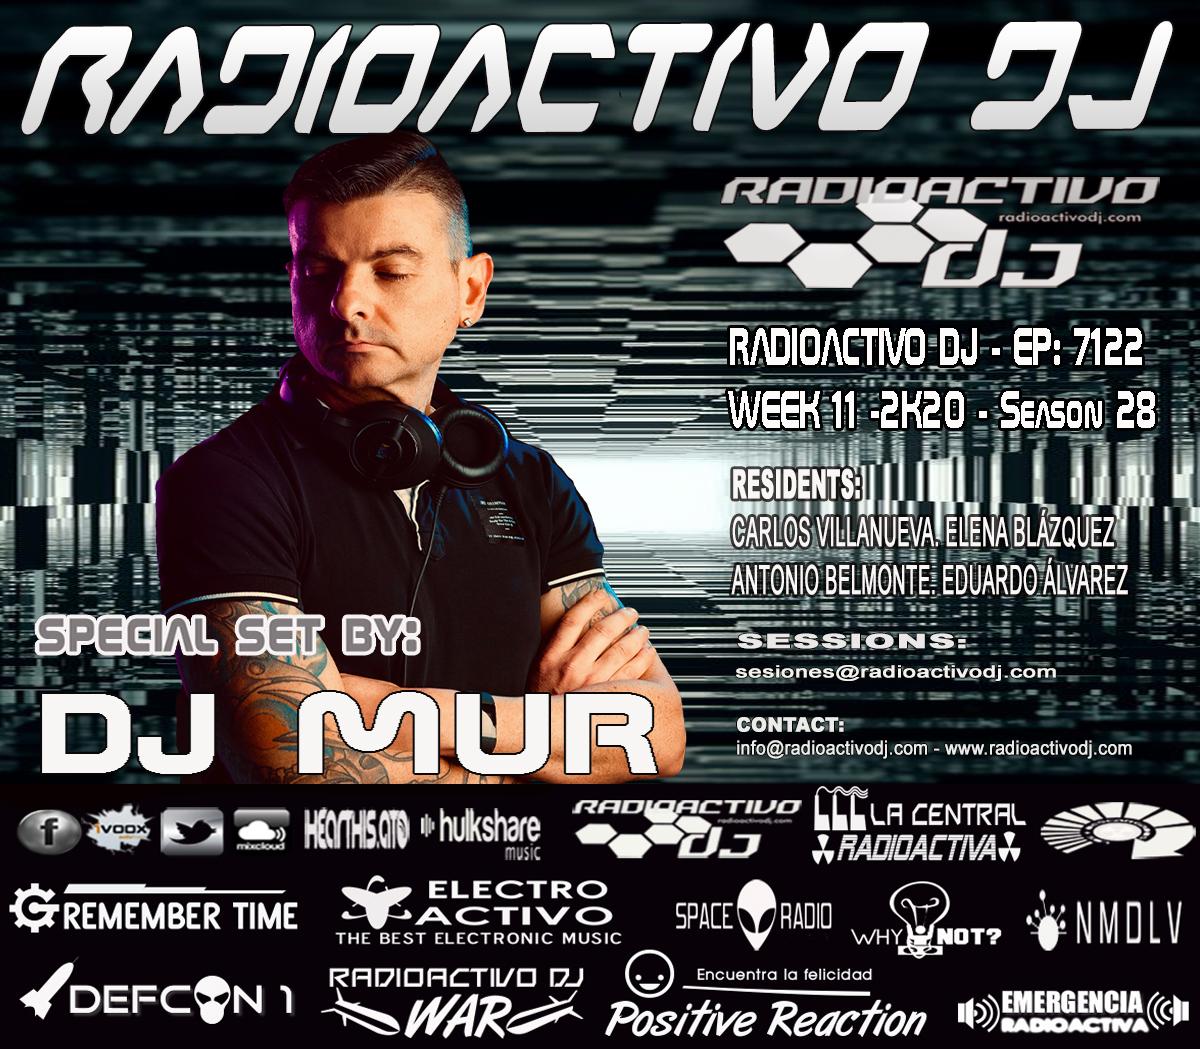 RADIOACTIVO-DJ-11-2020